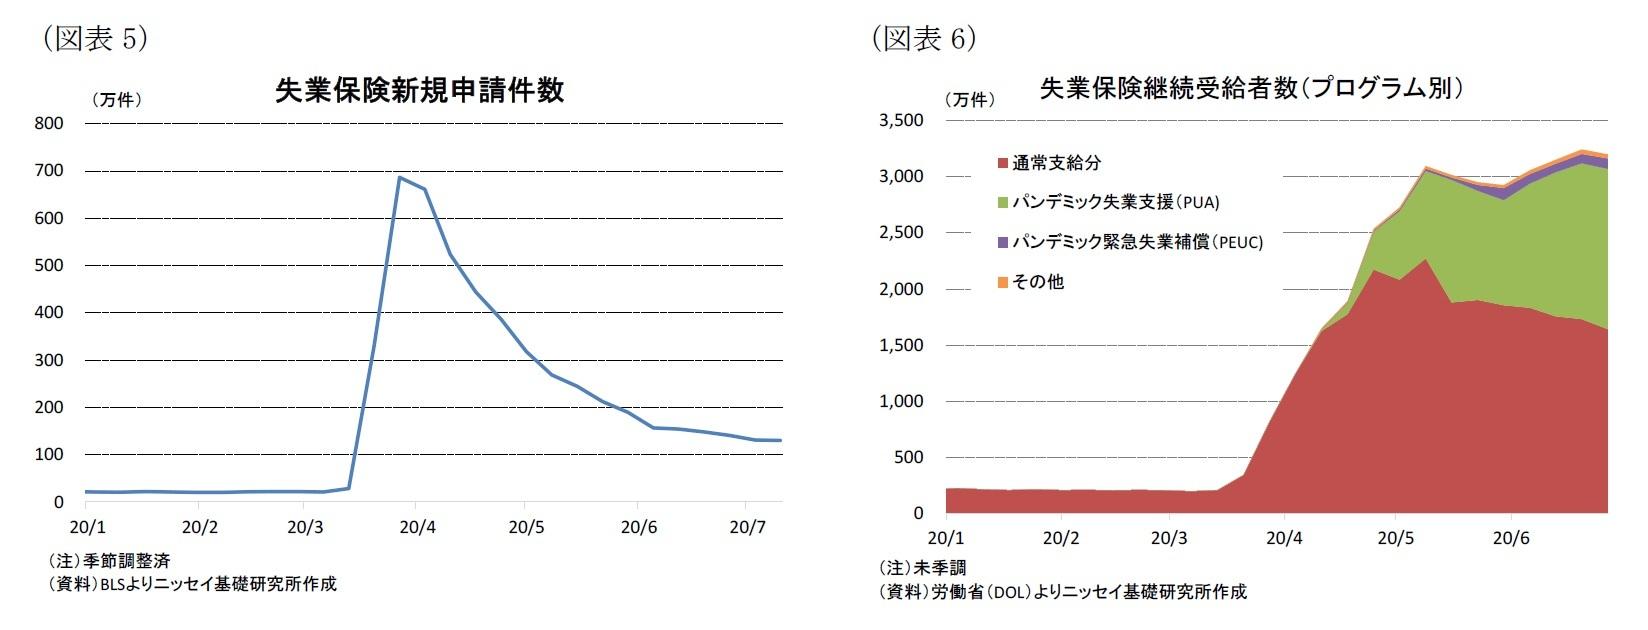 (図表5)失業保険新規申請件数/(図表6)失業保険継続受給者数(プログラム別)